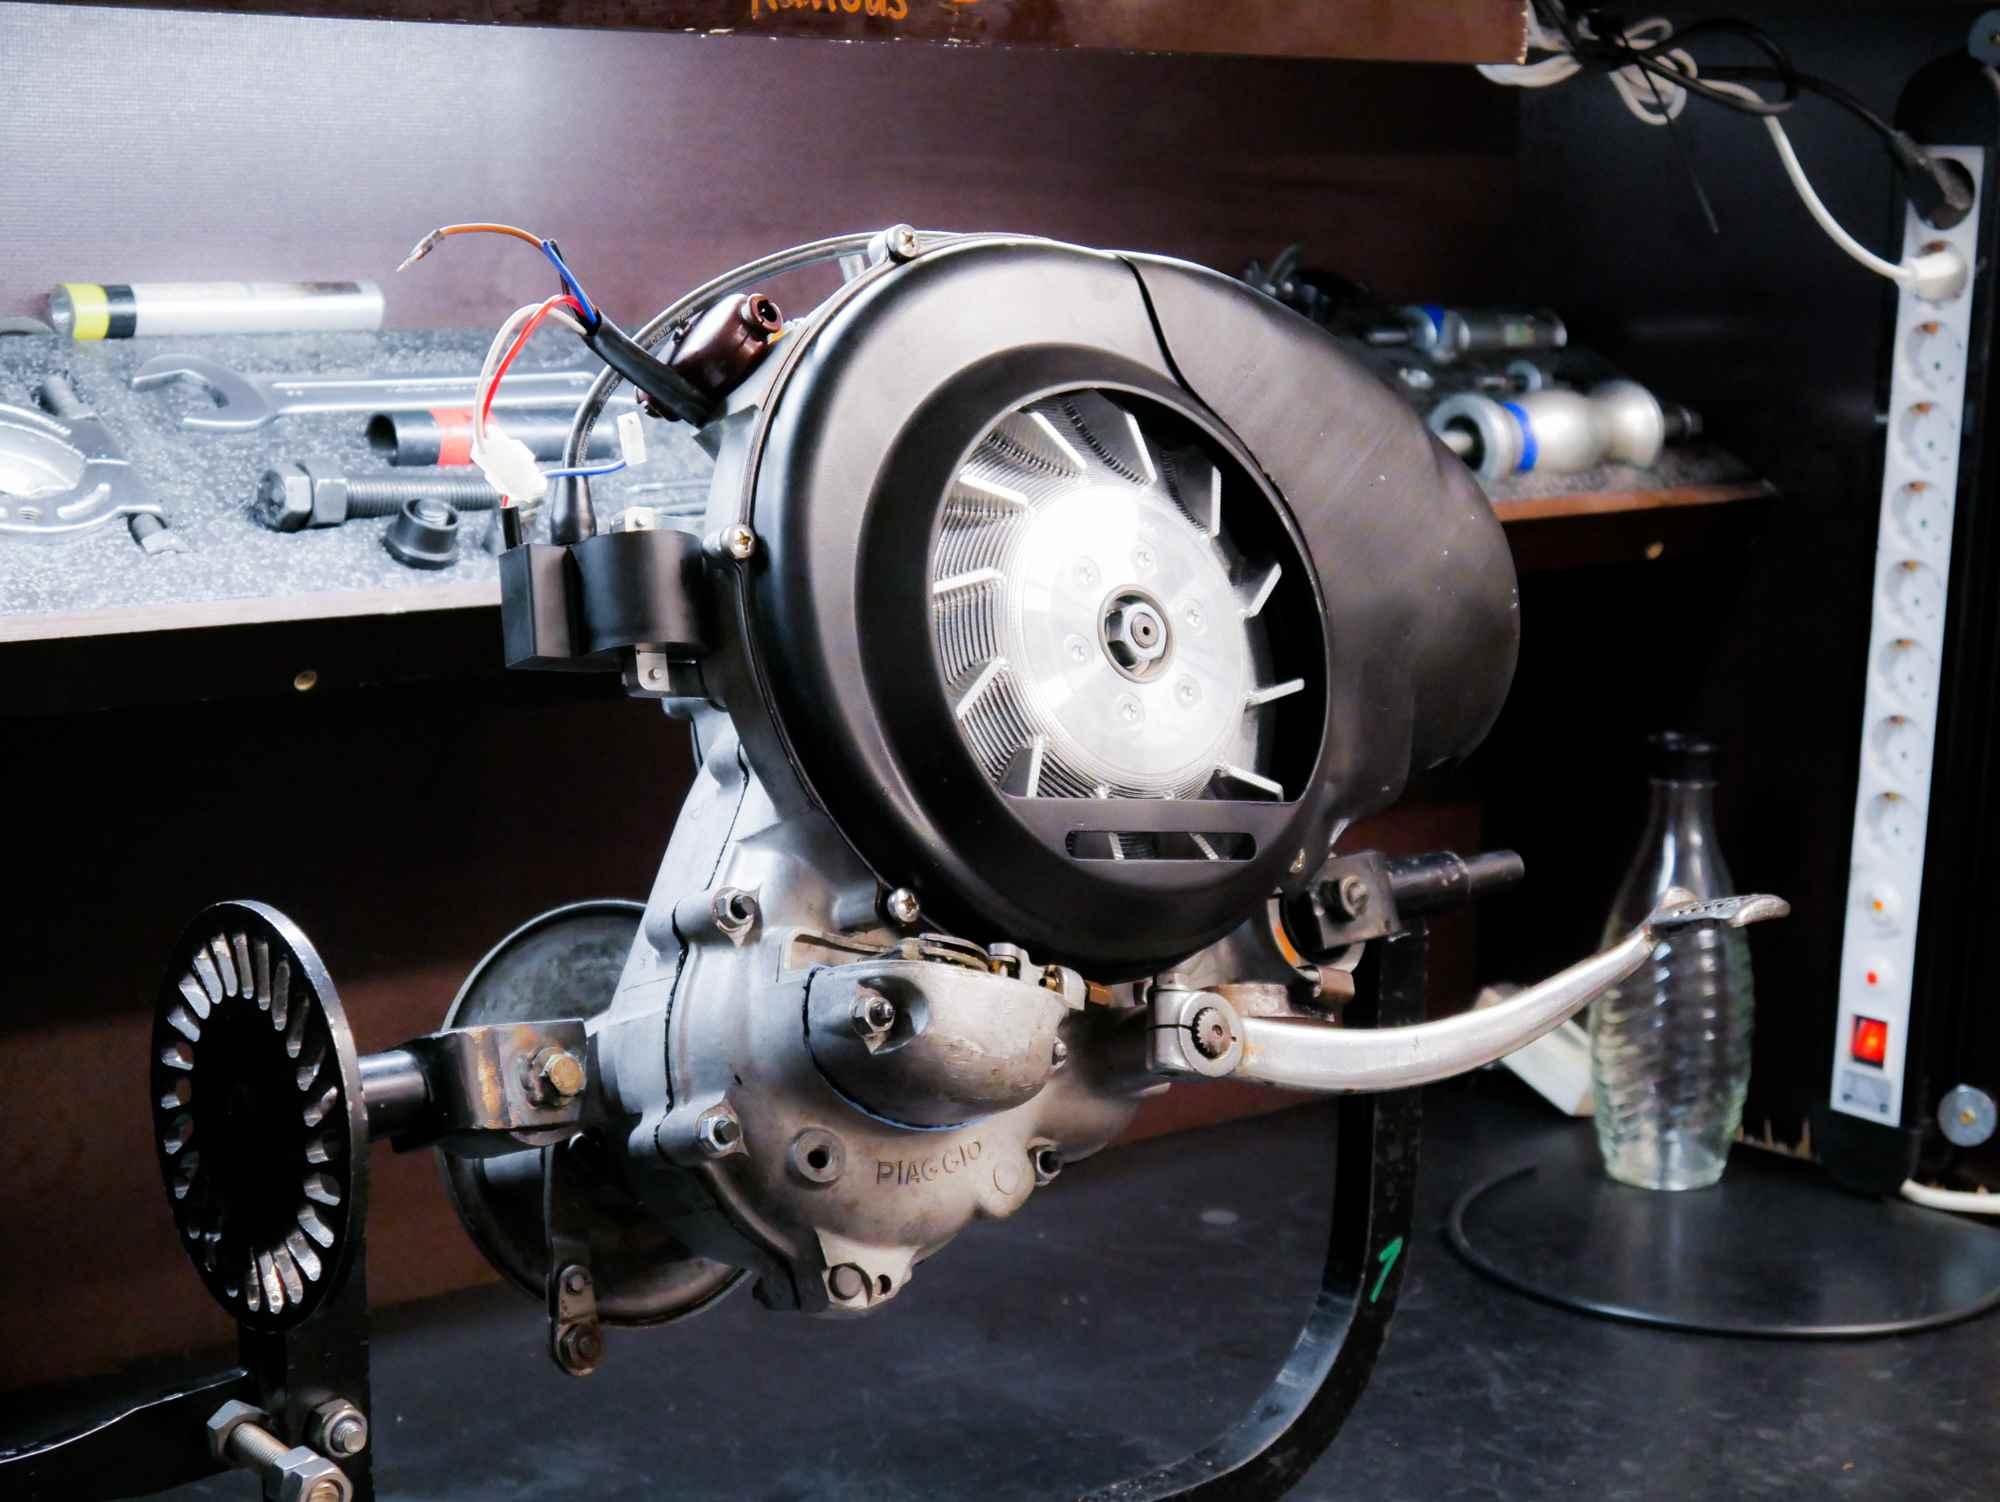 Vespa VBB Motor nach Motorrevision mit Tuning und Elektronikzündung